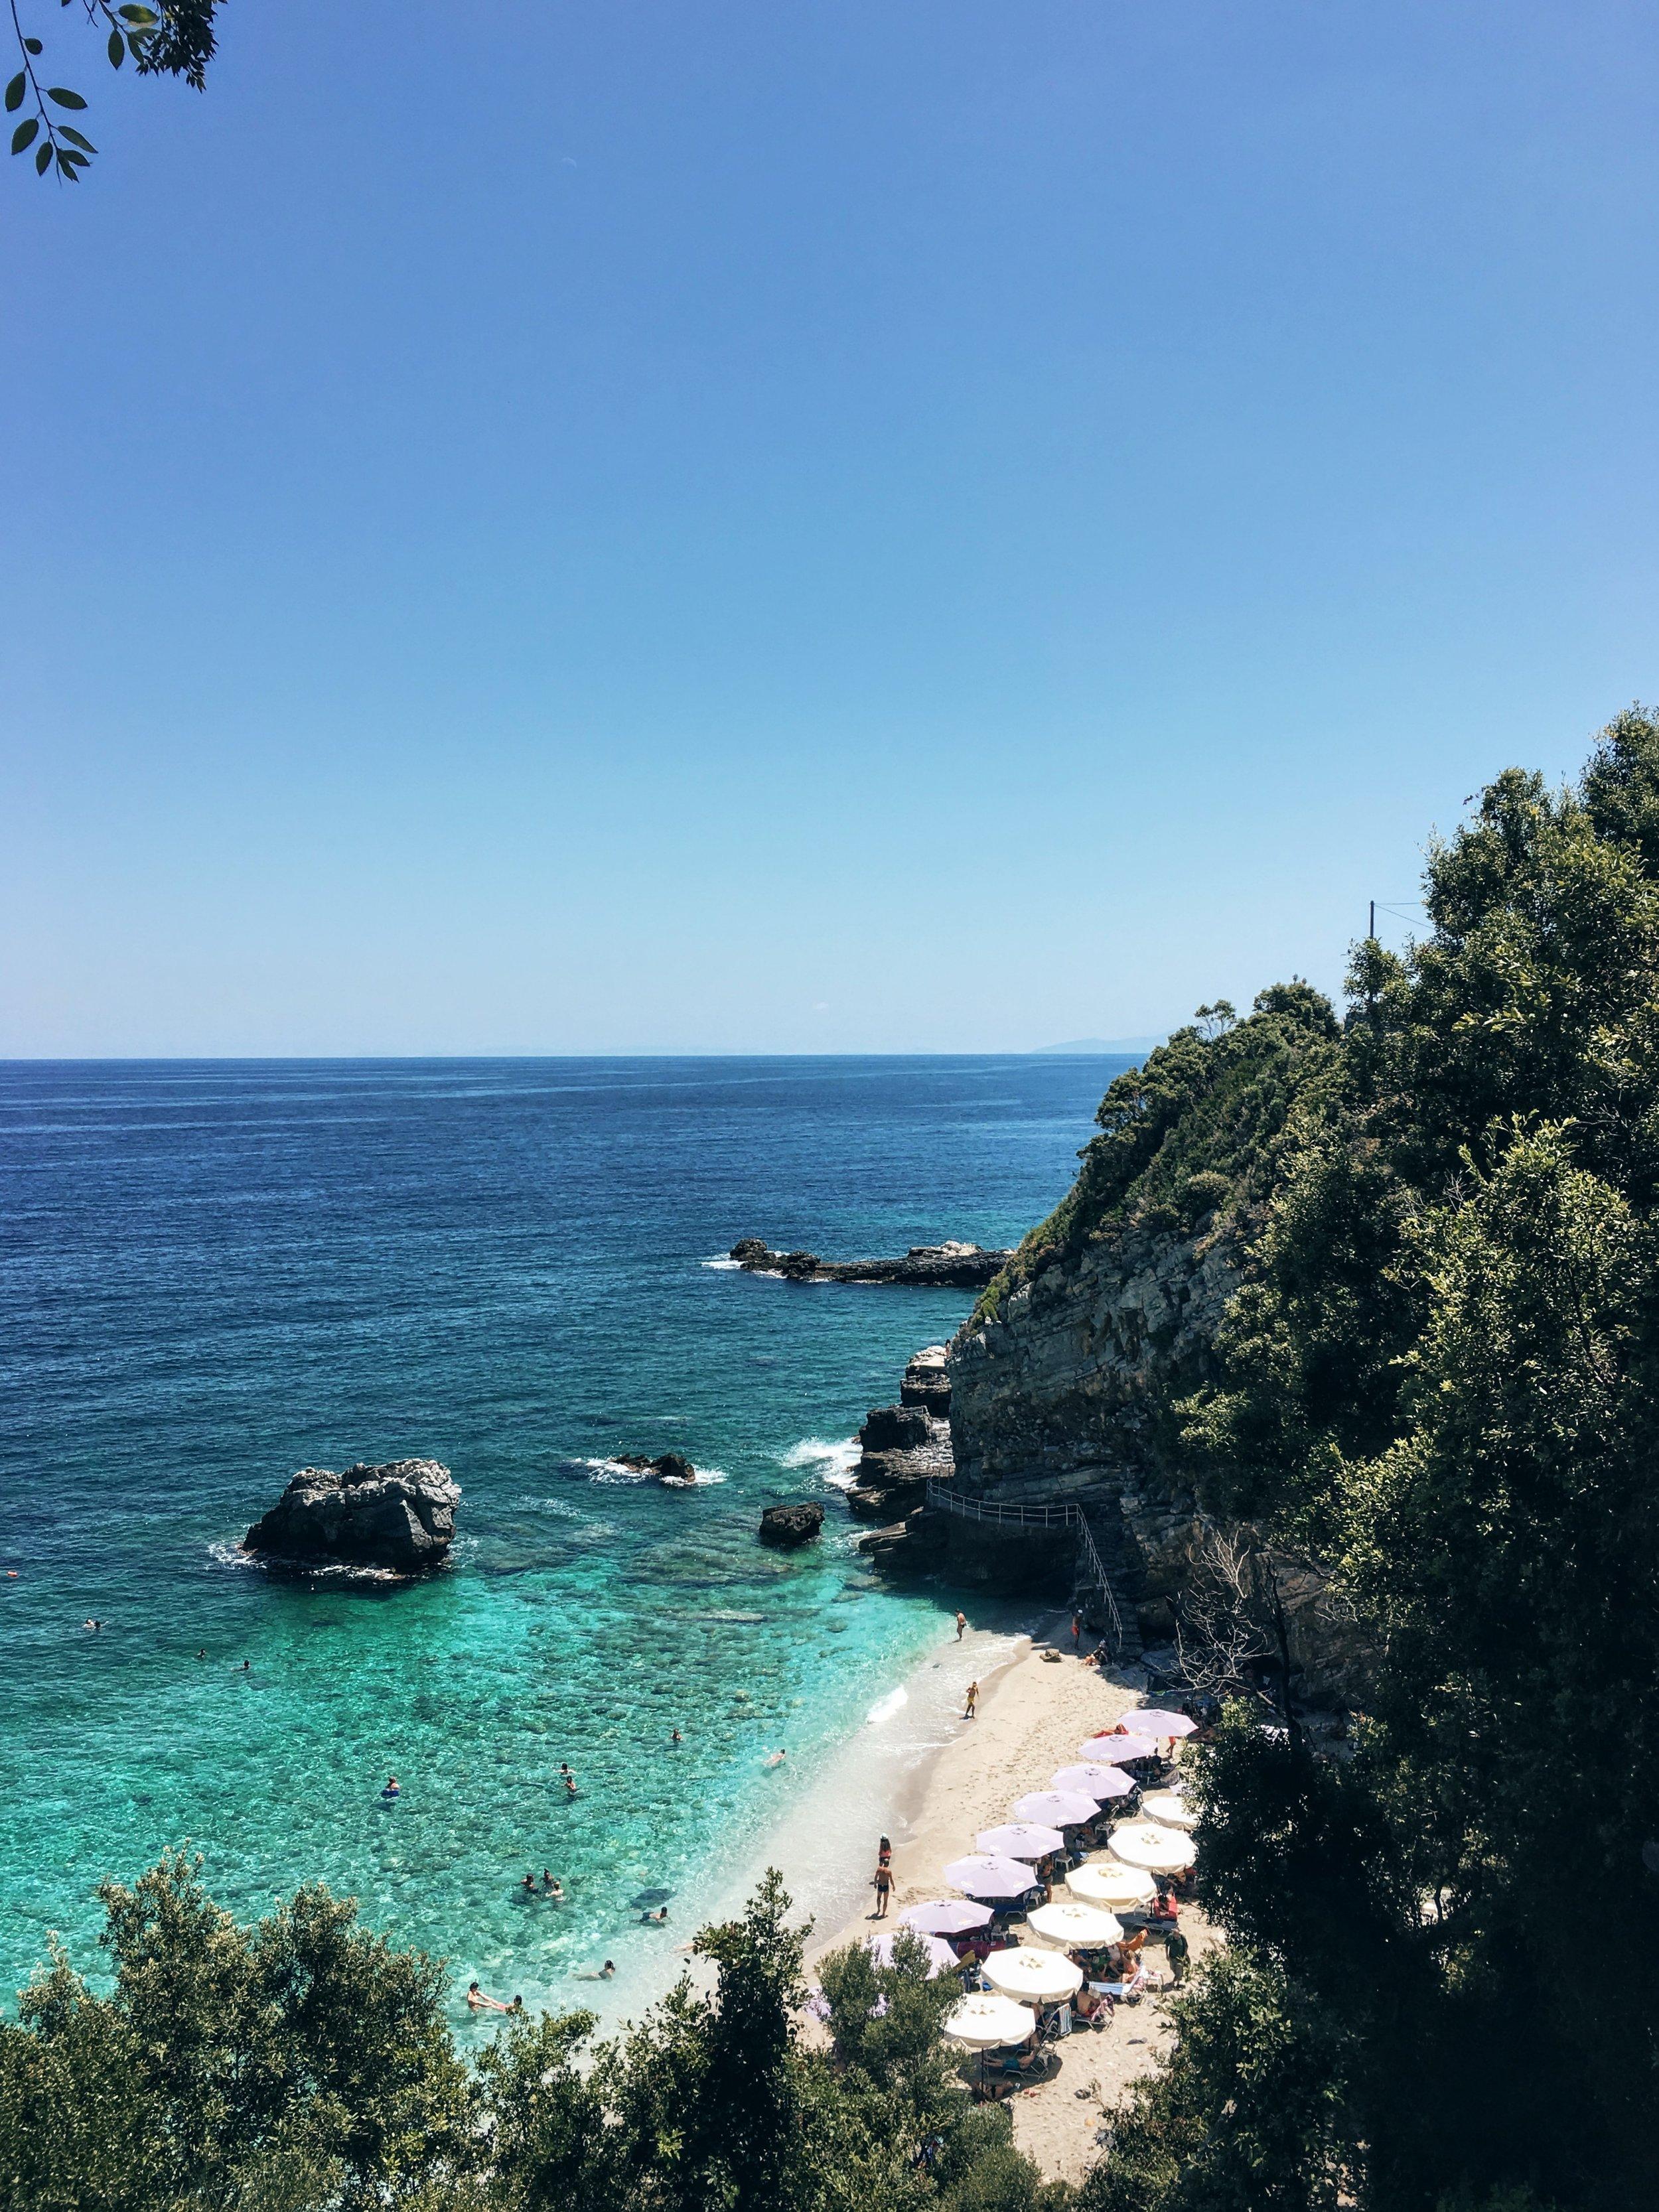 The beach of Mylopotamos